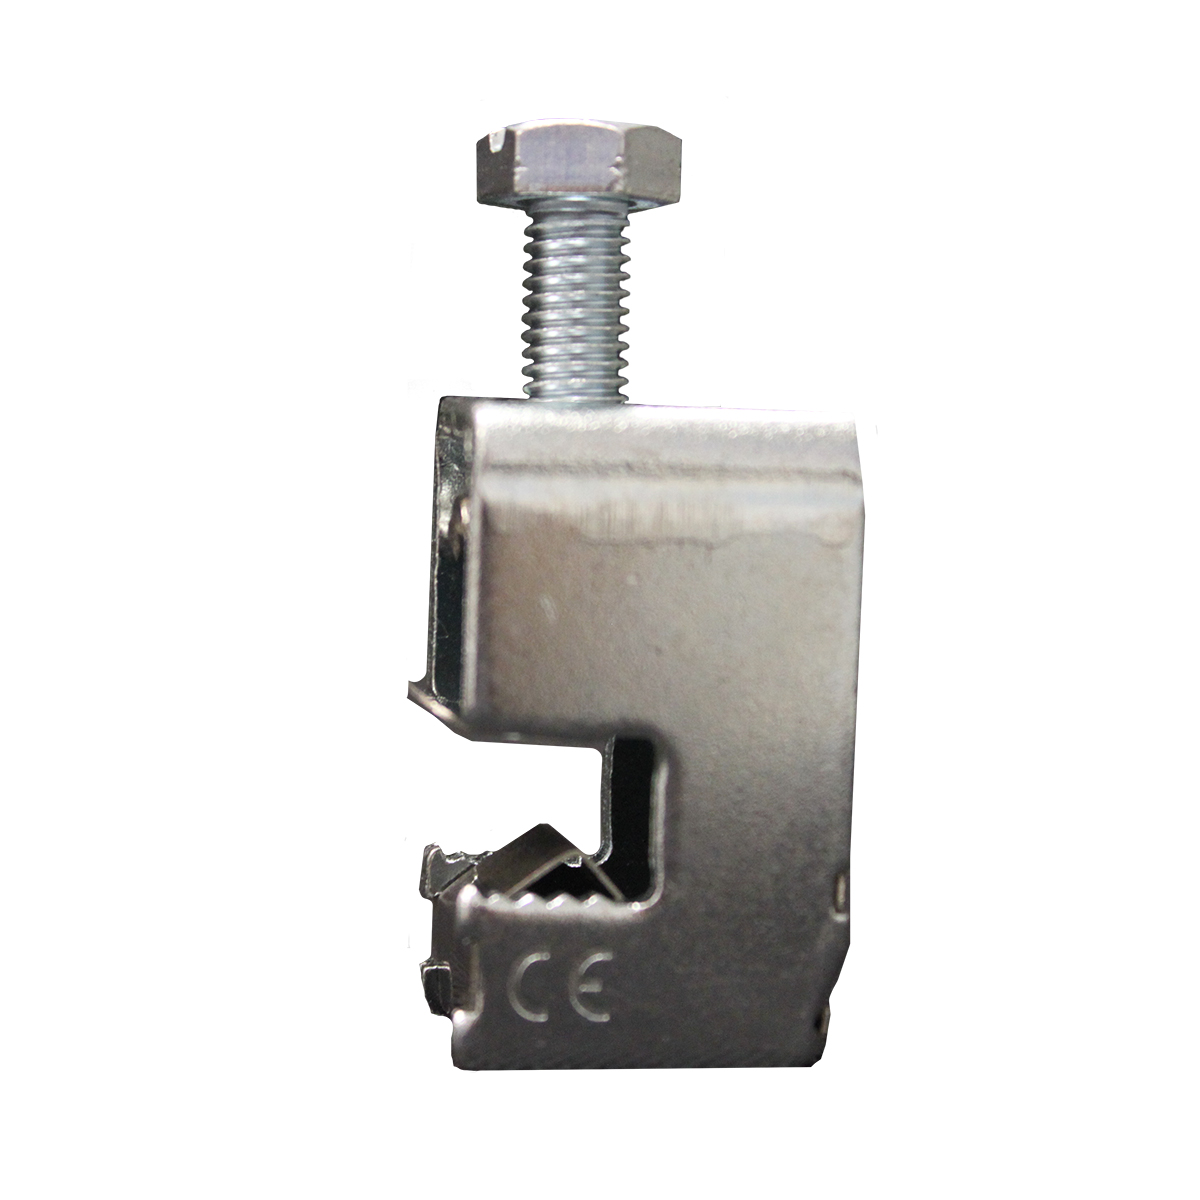 1 Stk Alu-Kupfer-Leiteranschlußklemme 1,5 -16mm² / 10mm IS5051610-